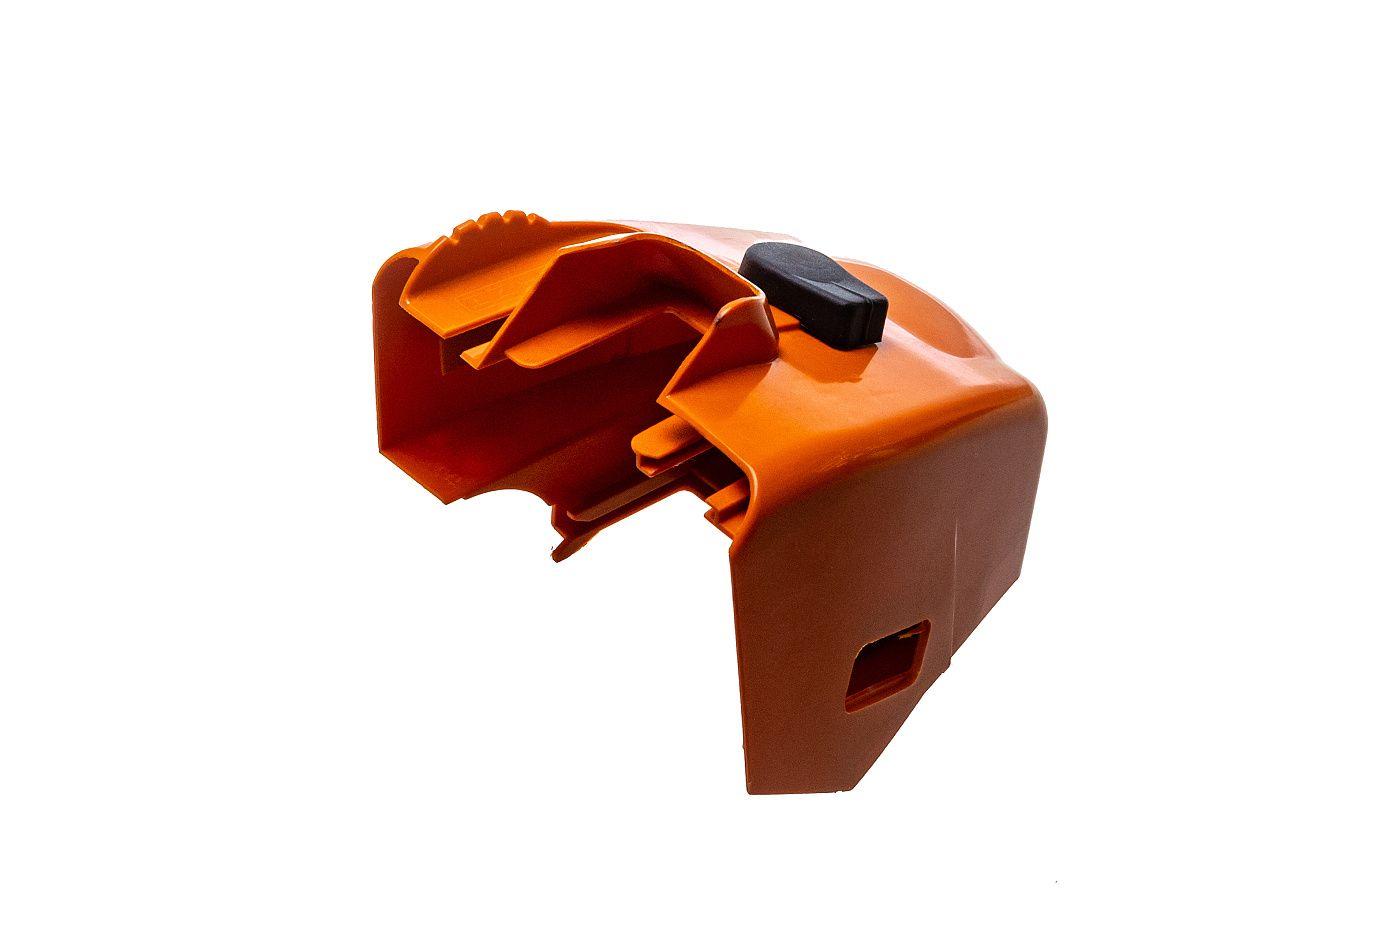 Kryt vzduchového filtra Stihl MS340 MS360 034 036 (1125 140 1913)